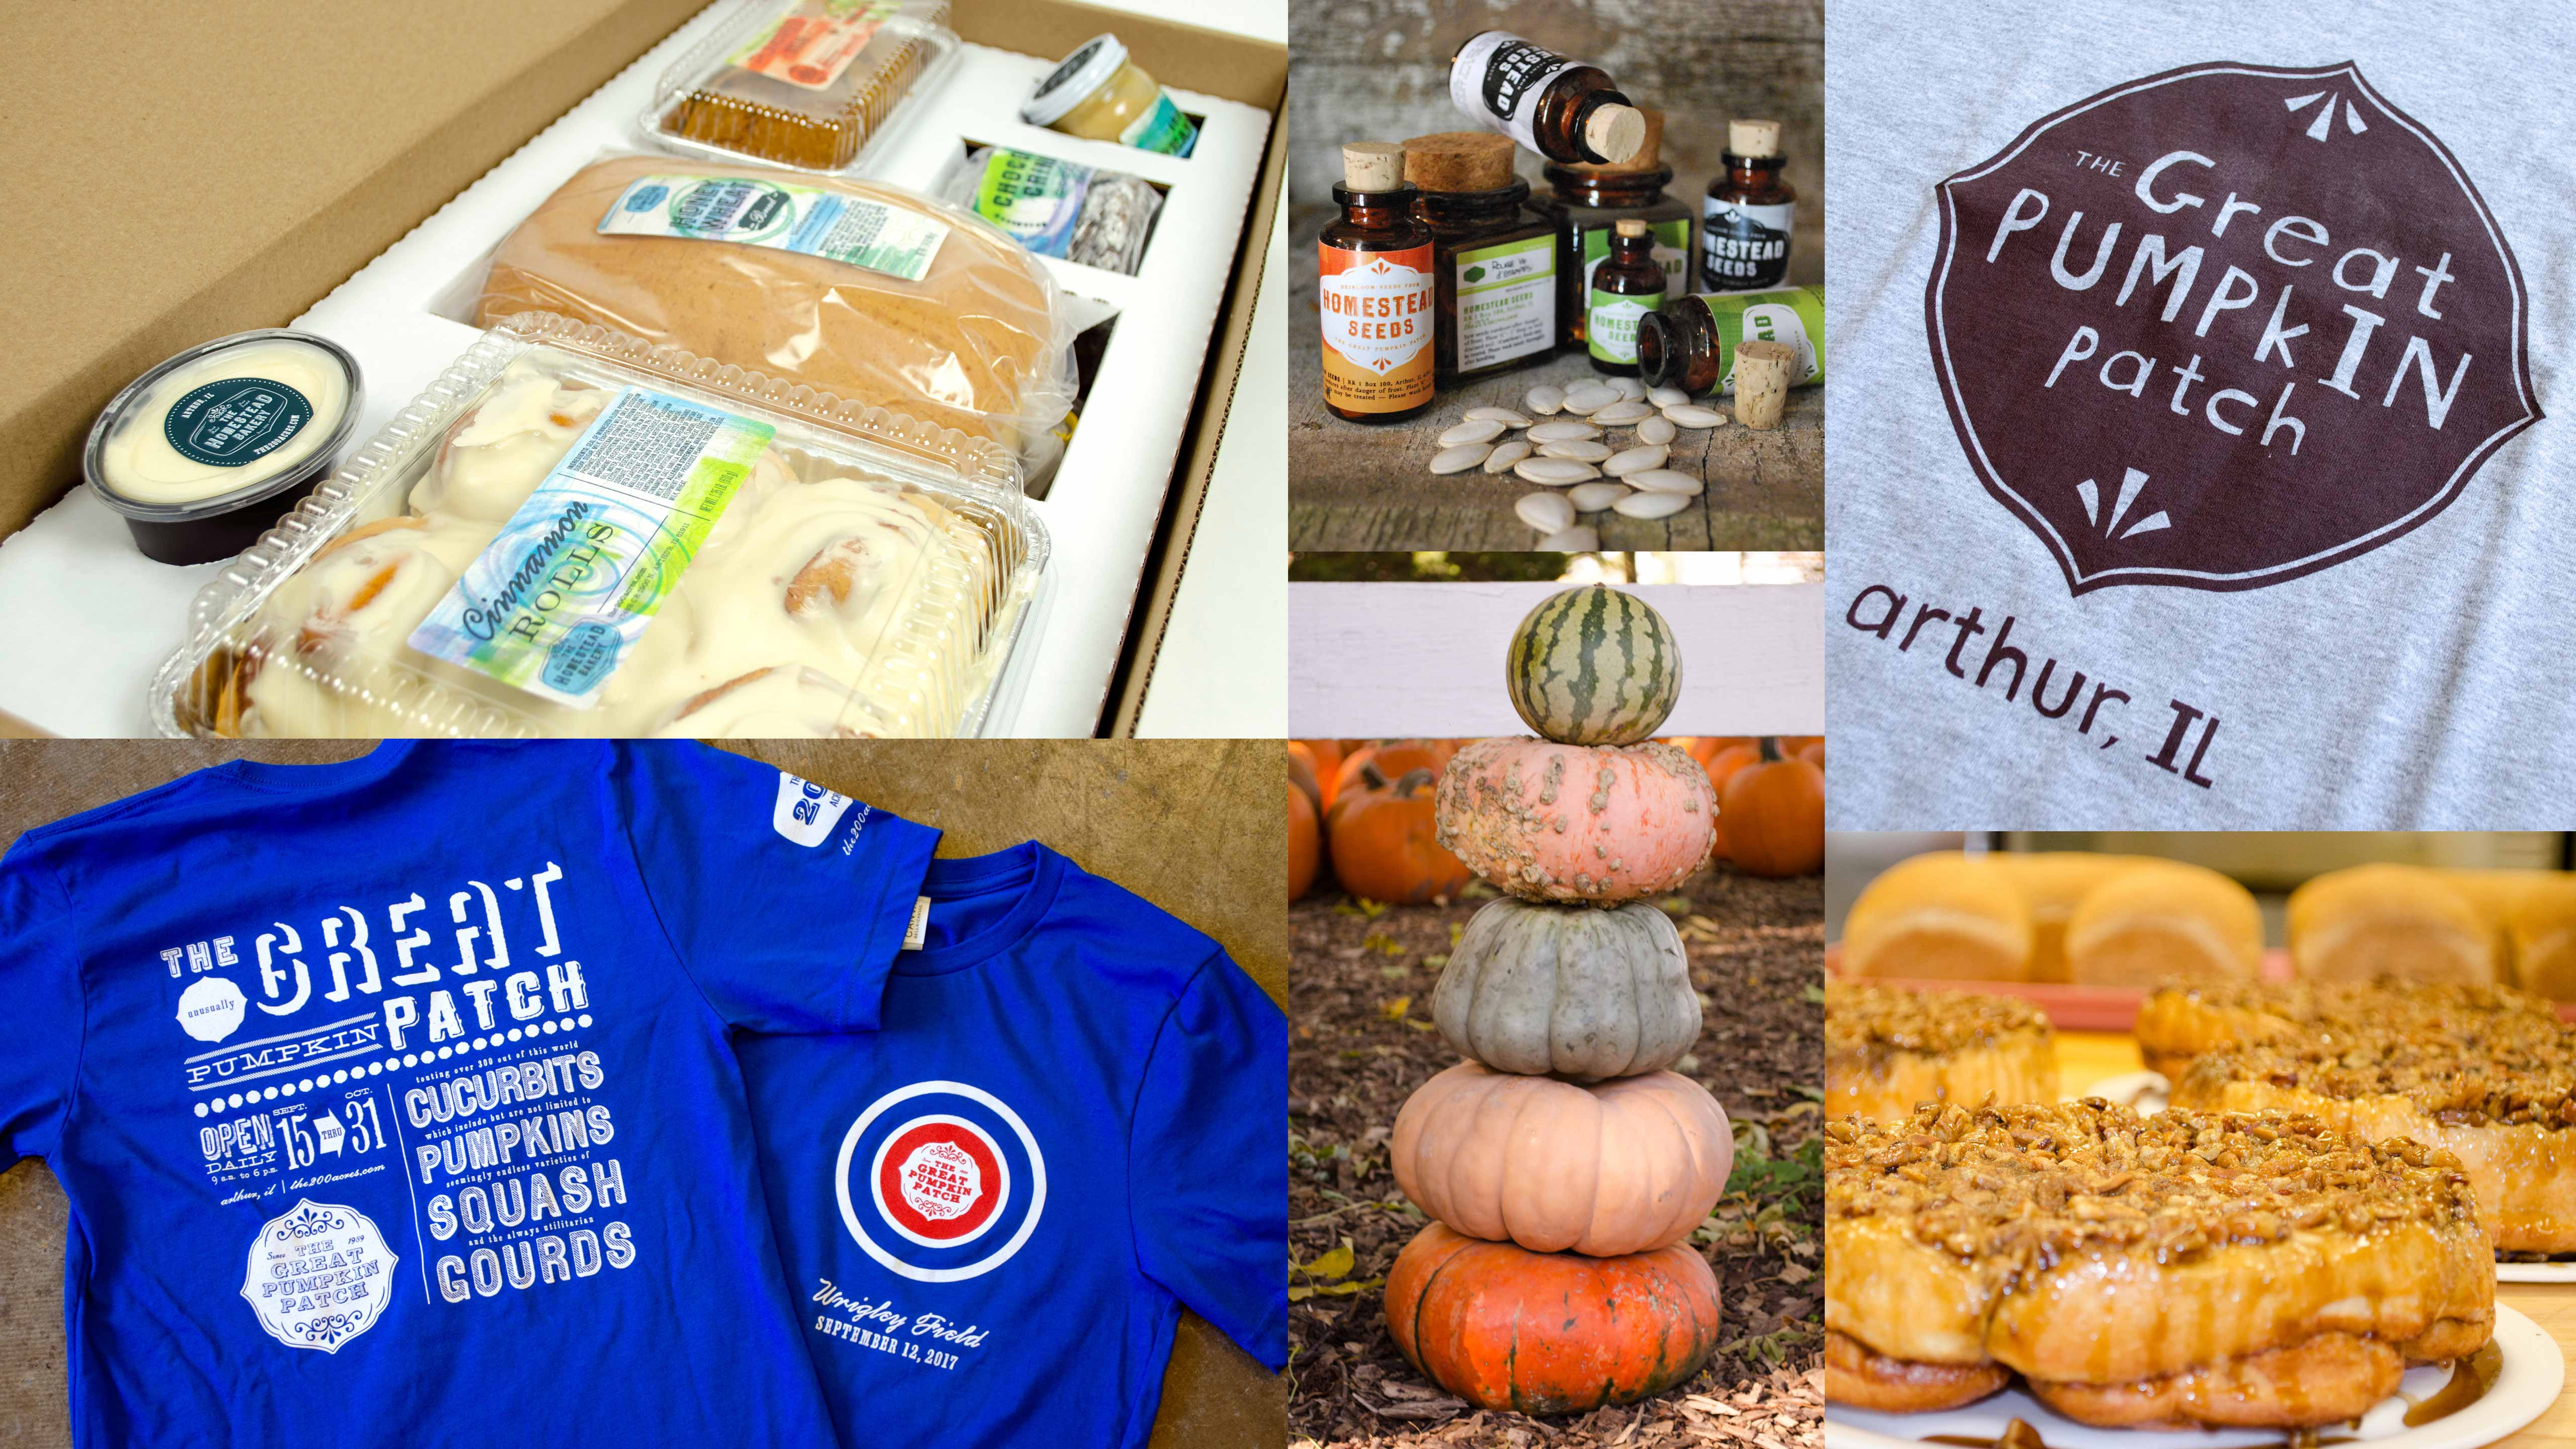 The Great Pumpkin Patch - Arthur, Illinois - Branding